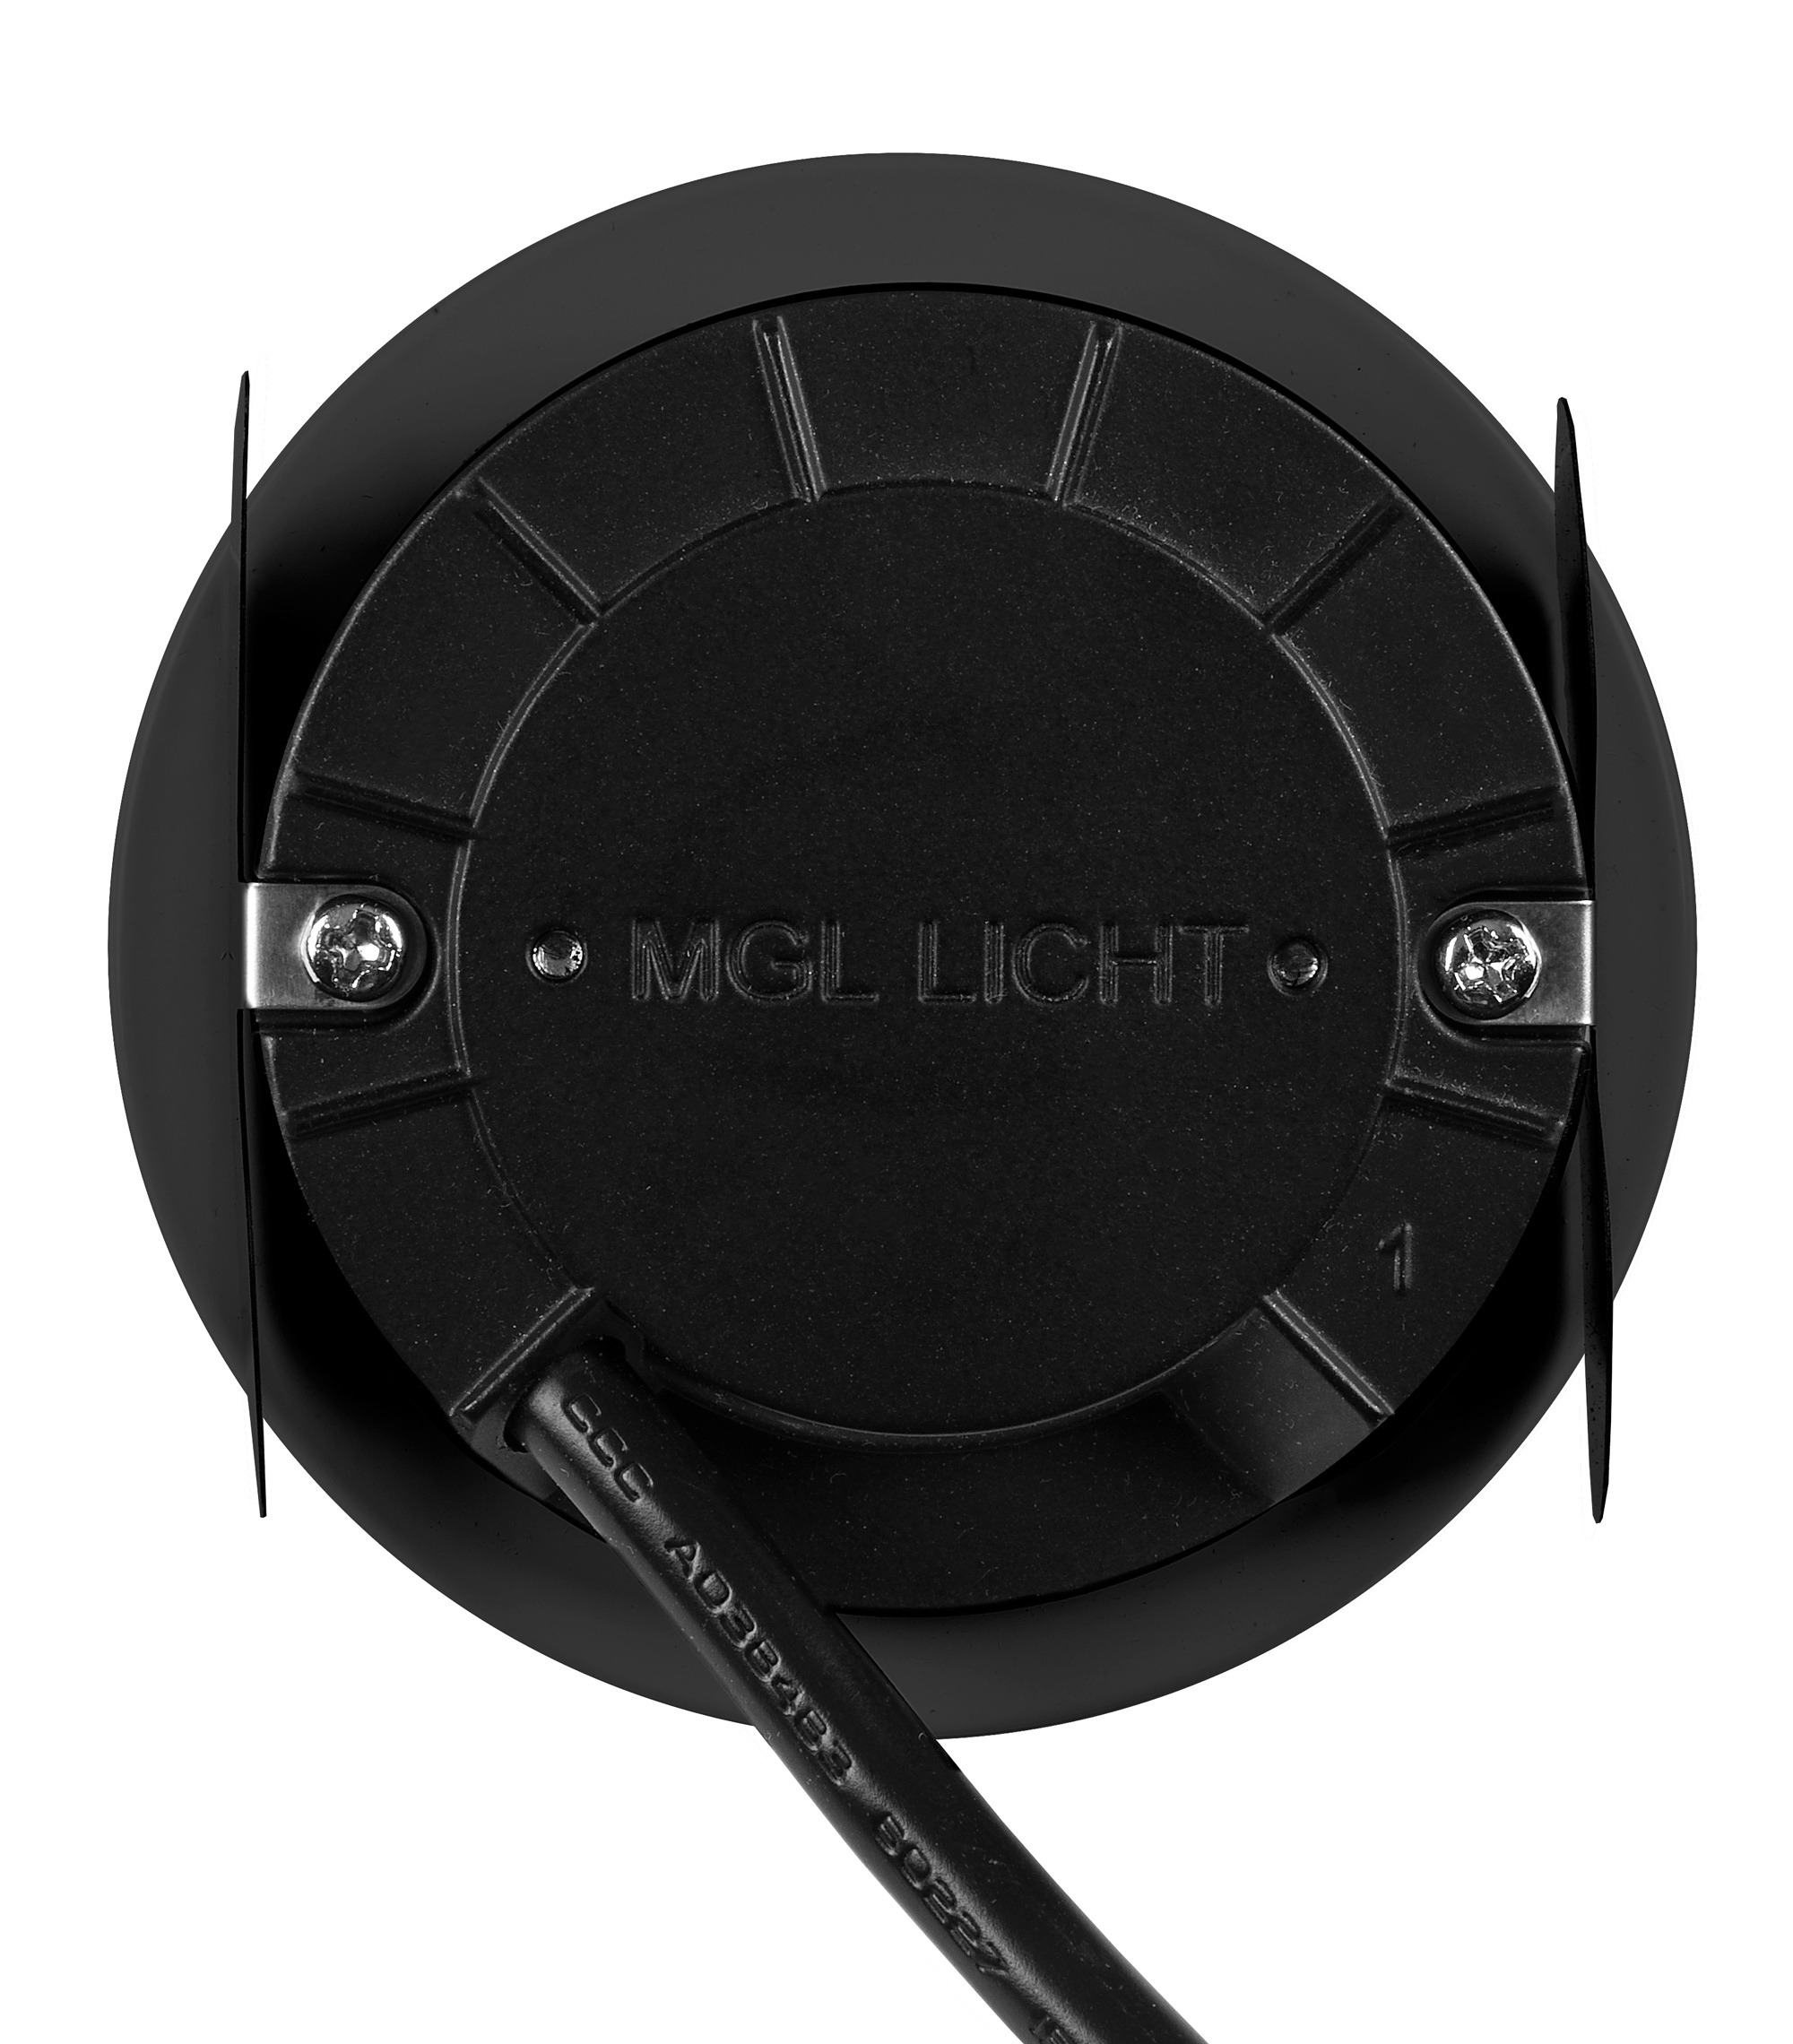 MGL1142 MDL68 HVD Schwarz Rueckseite